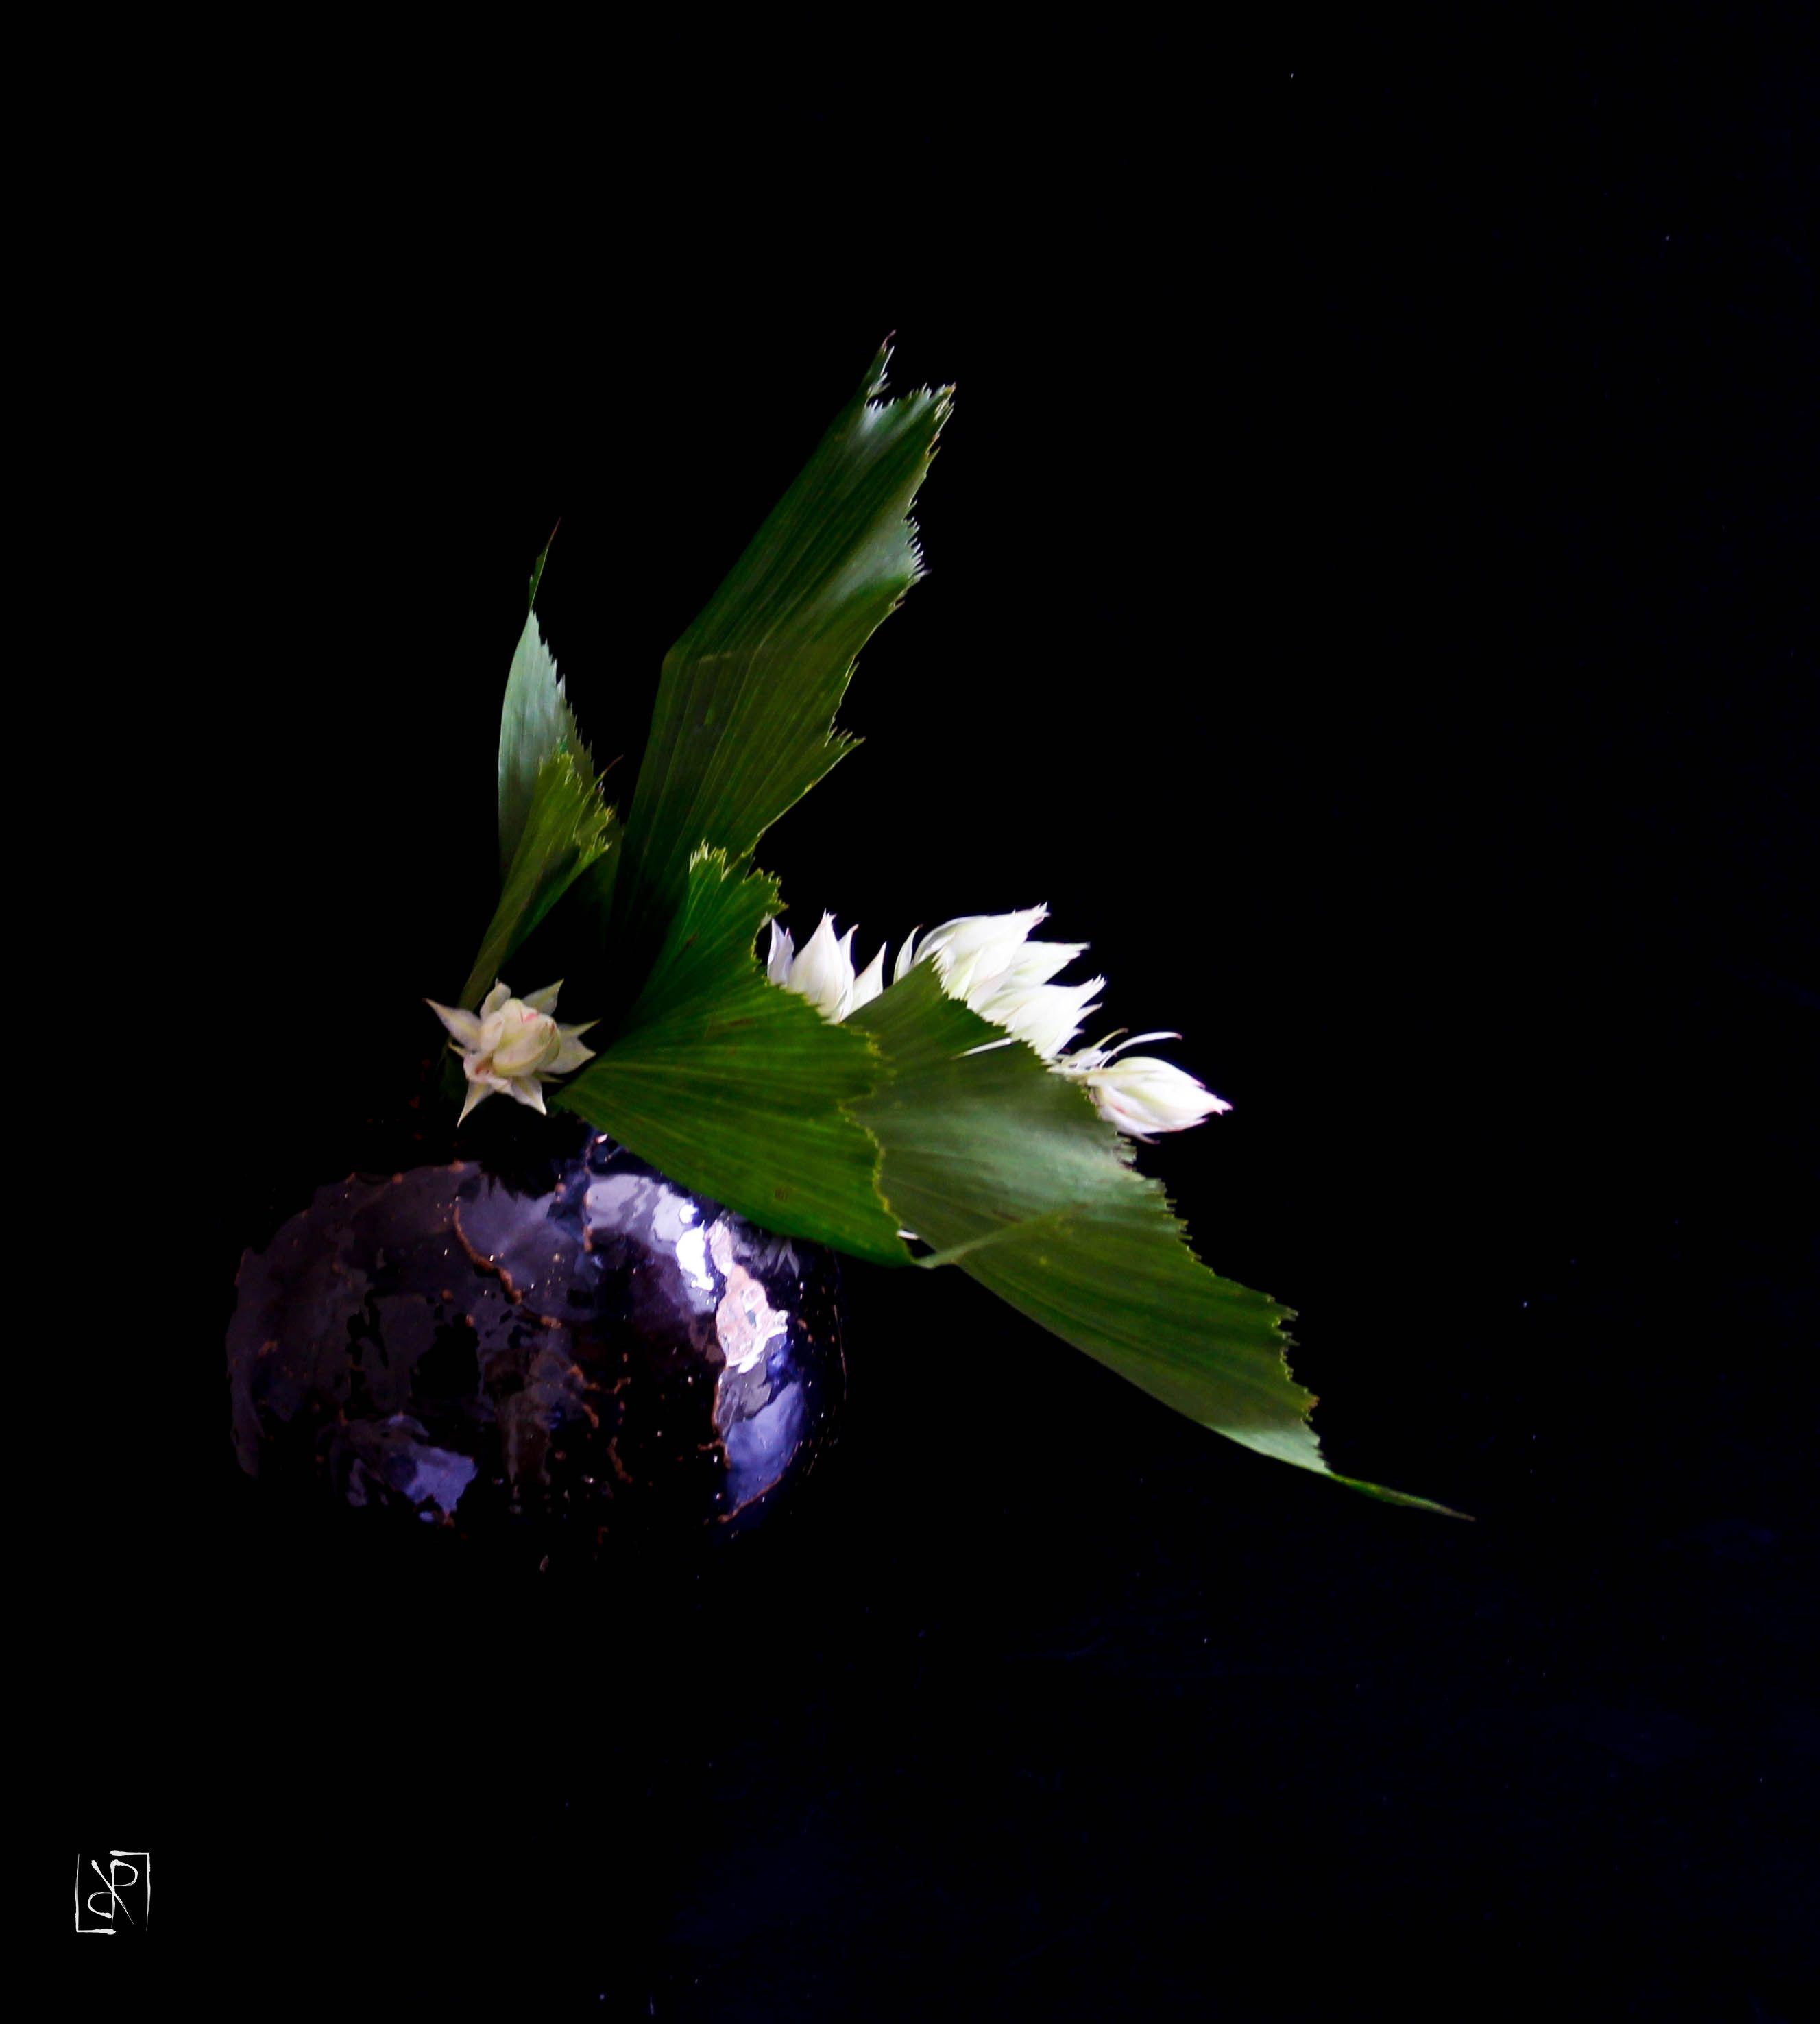 Ikebana di Luca Ramacciotti (vaso di Sebastiano Allegrini)  #ikebana #sogetsu #floral #florist #floralart #floristry